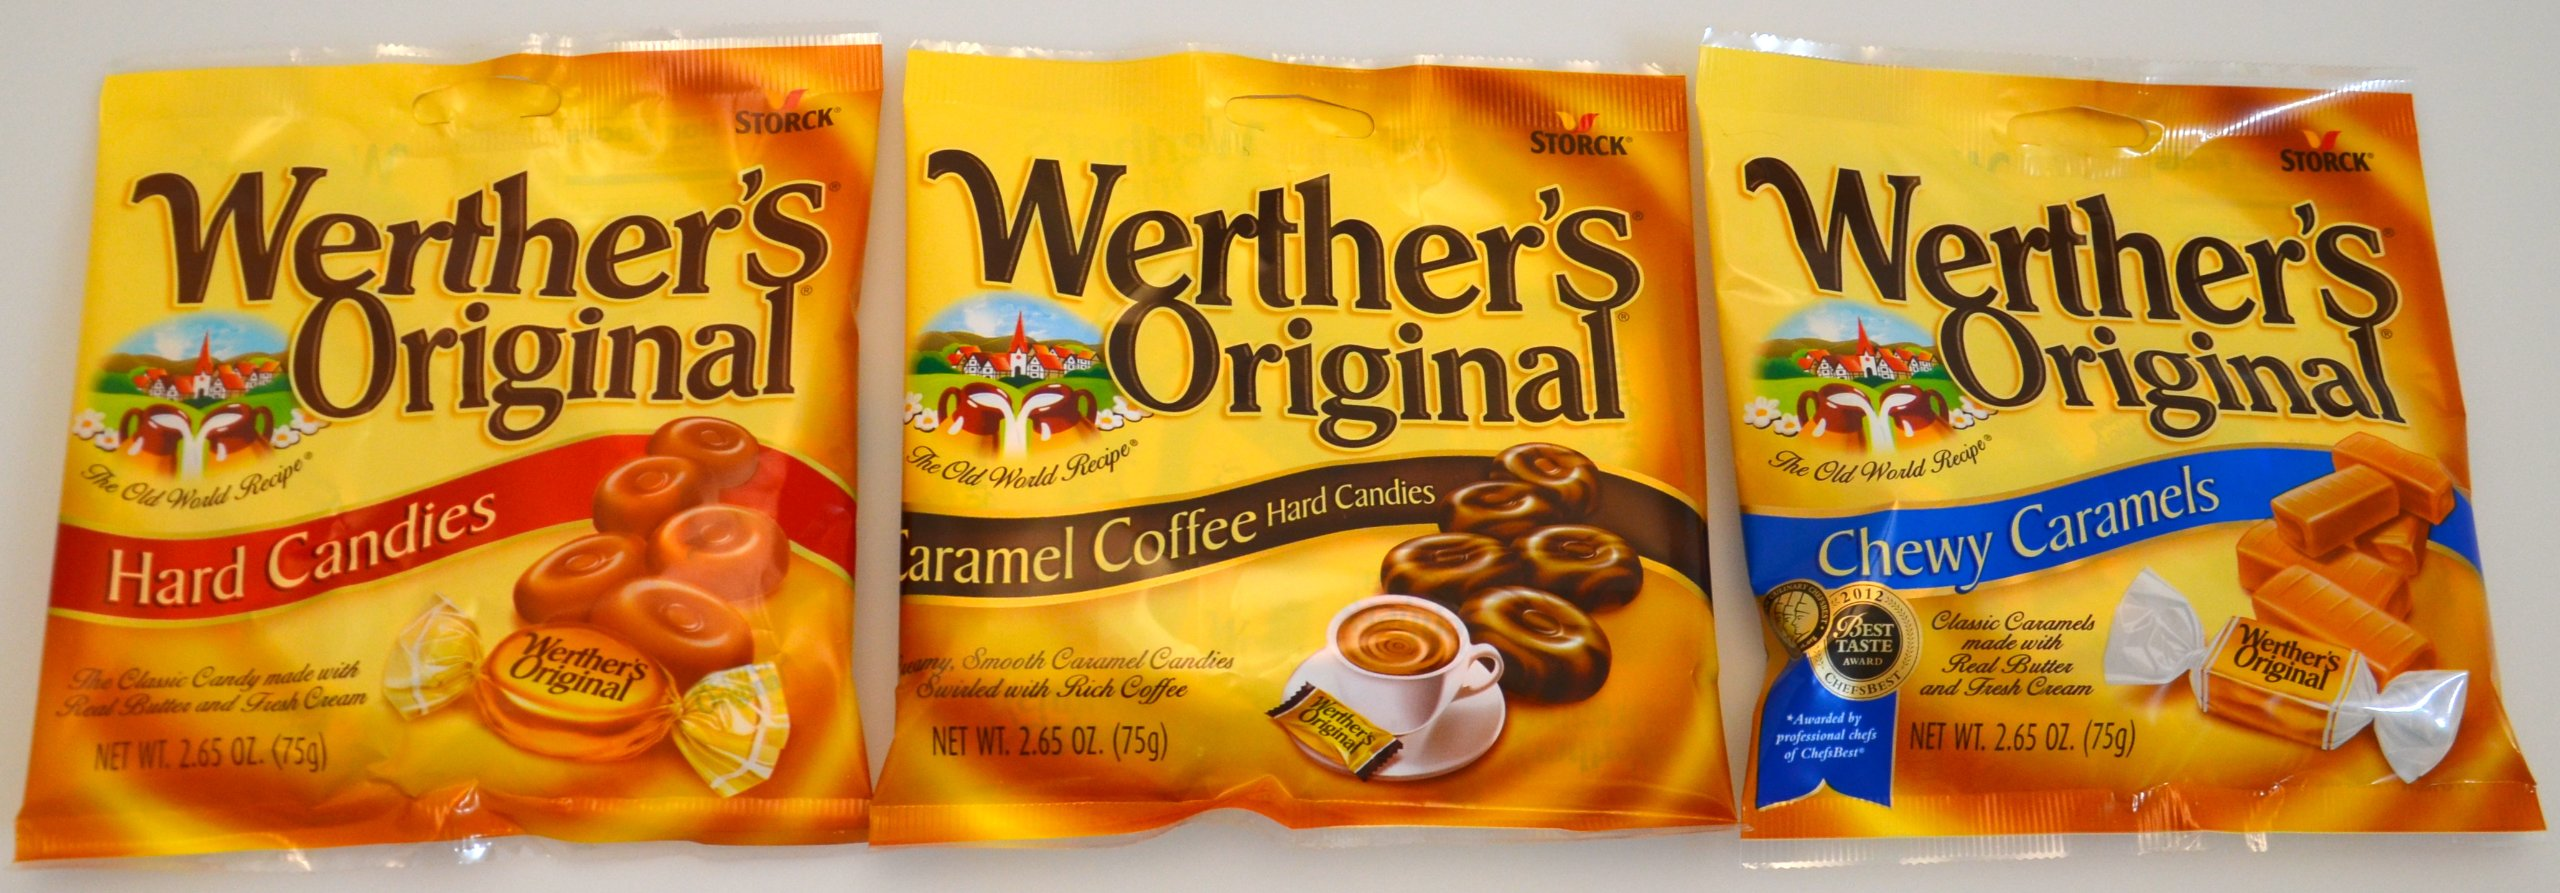 Werthers Original Variety Pack